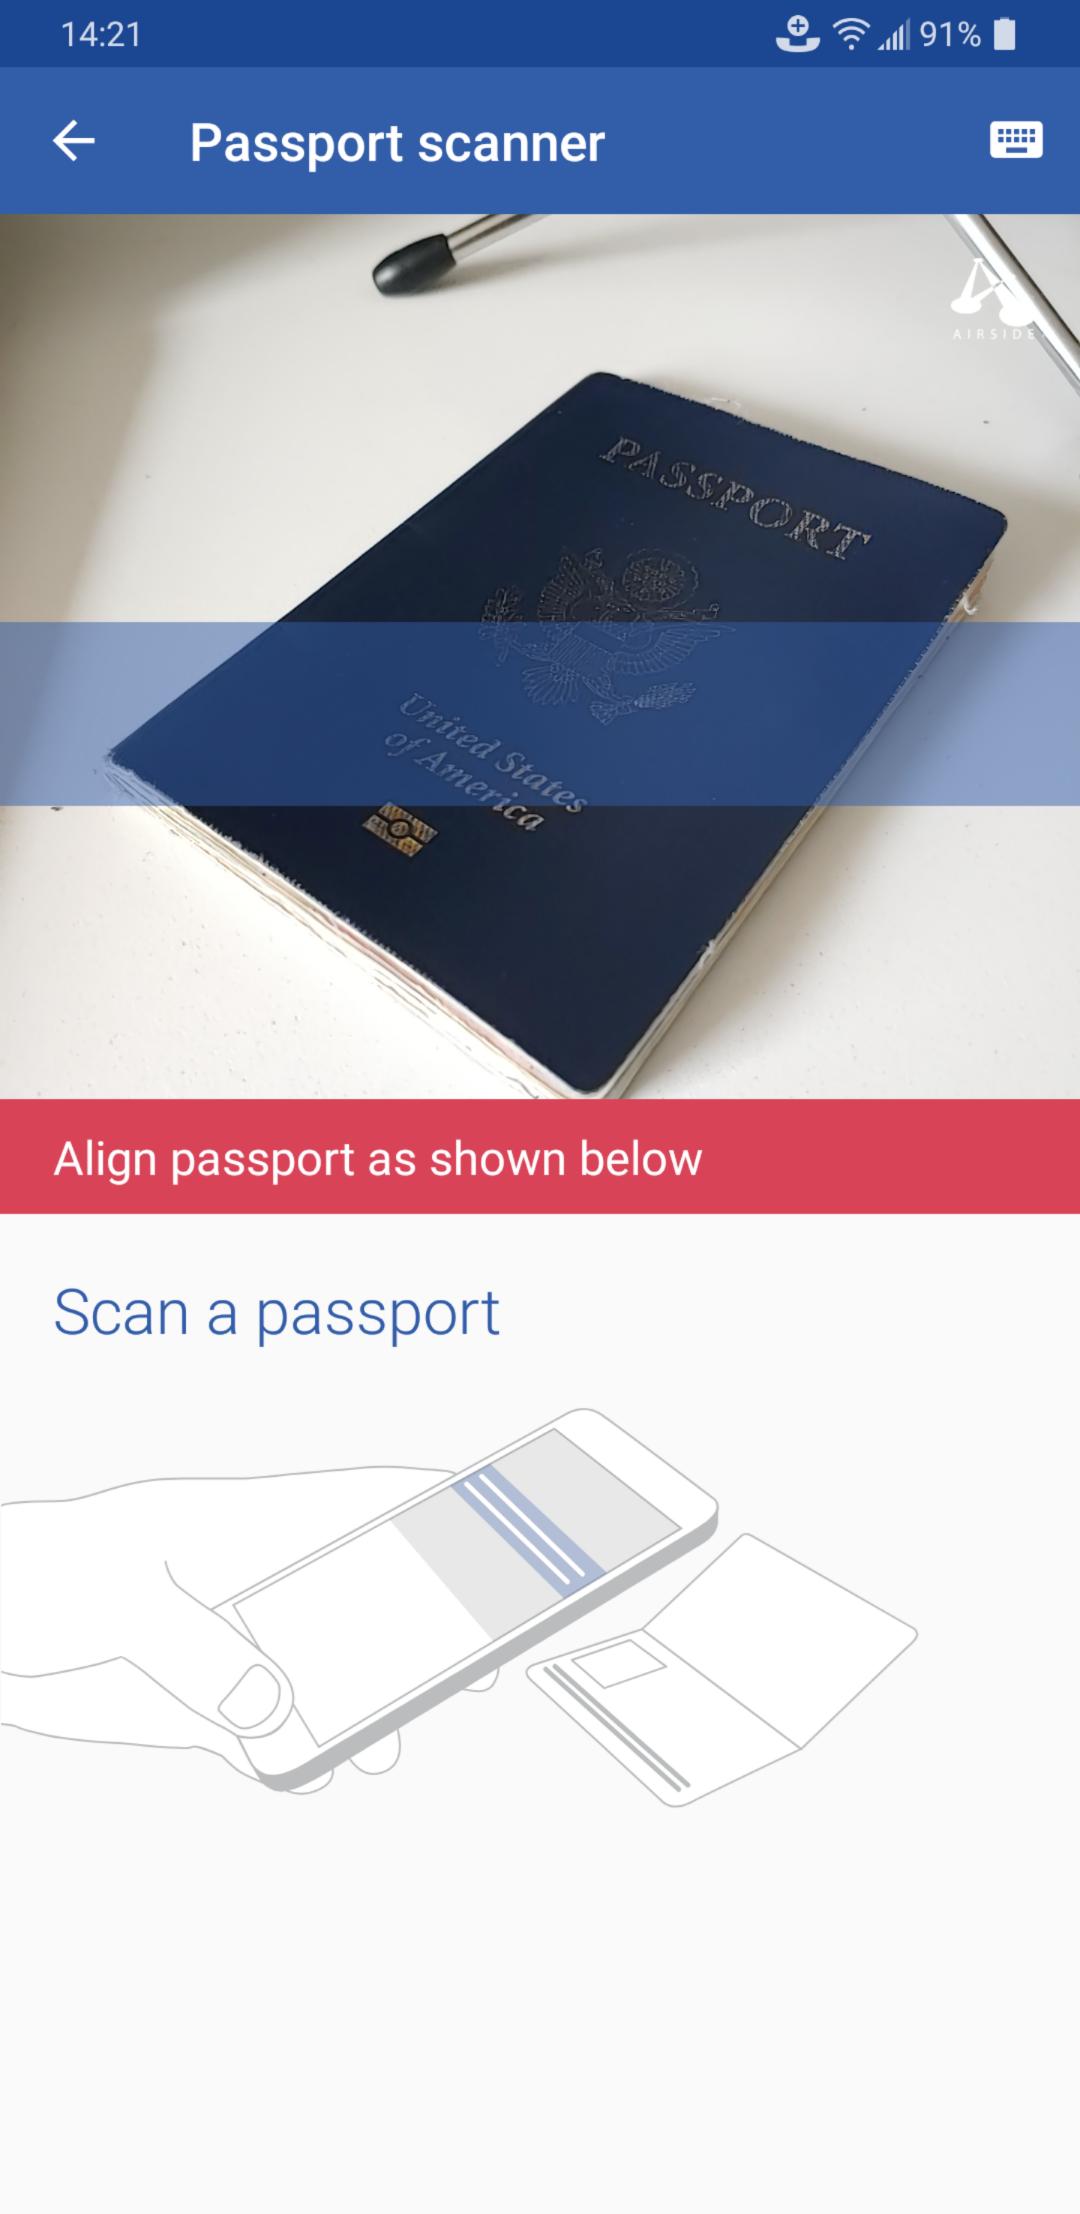 Mobile Passport app introduces Plus subscription, charges